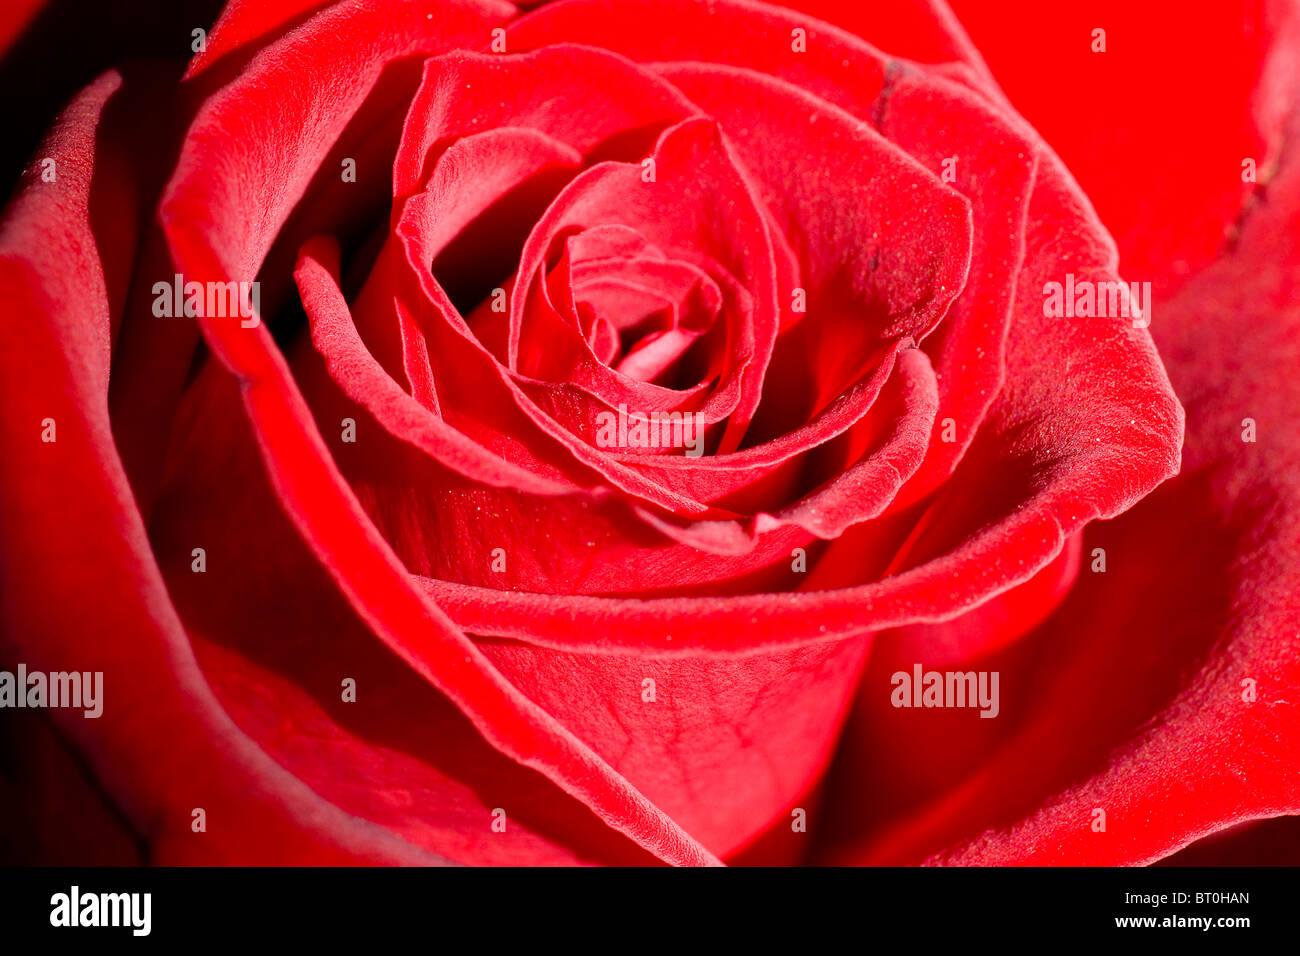 Romantic beautiful red rose close-up. Selective focus. - Stock Image